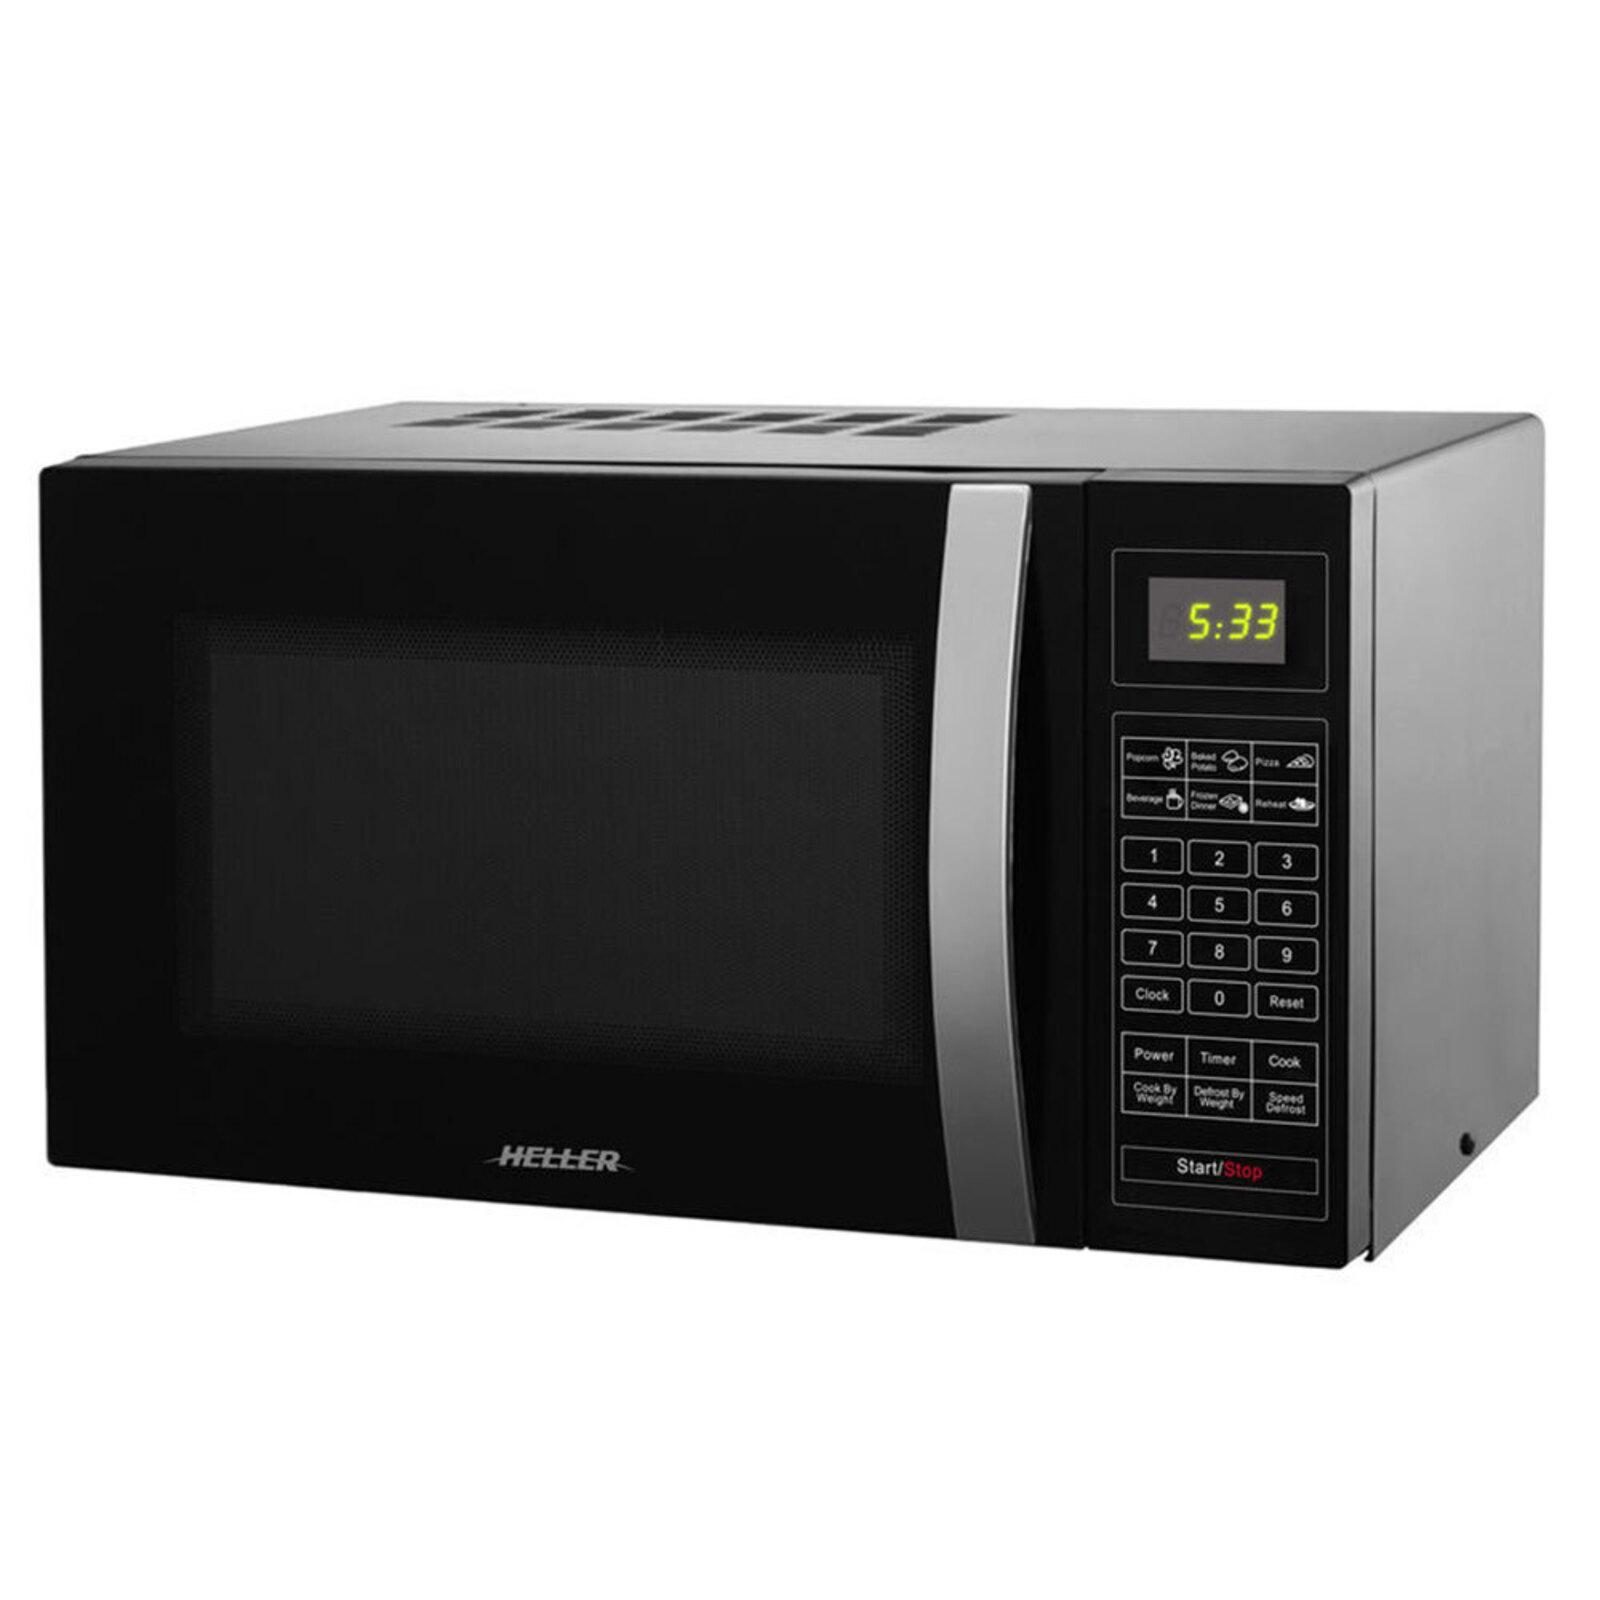 Heller 25L 900W Countertop LED Digital Cook/Heat/Defrost Microwave Oven Black